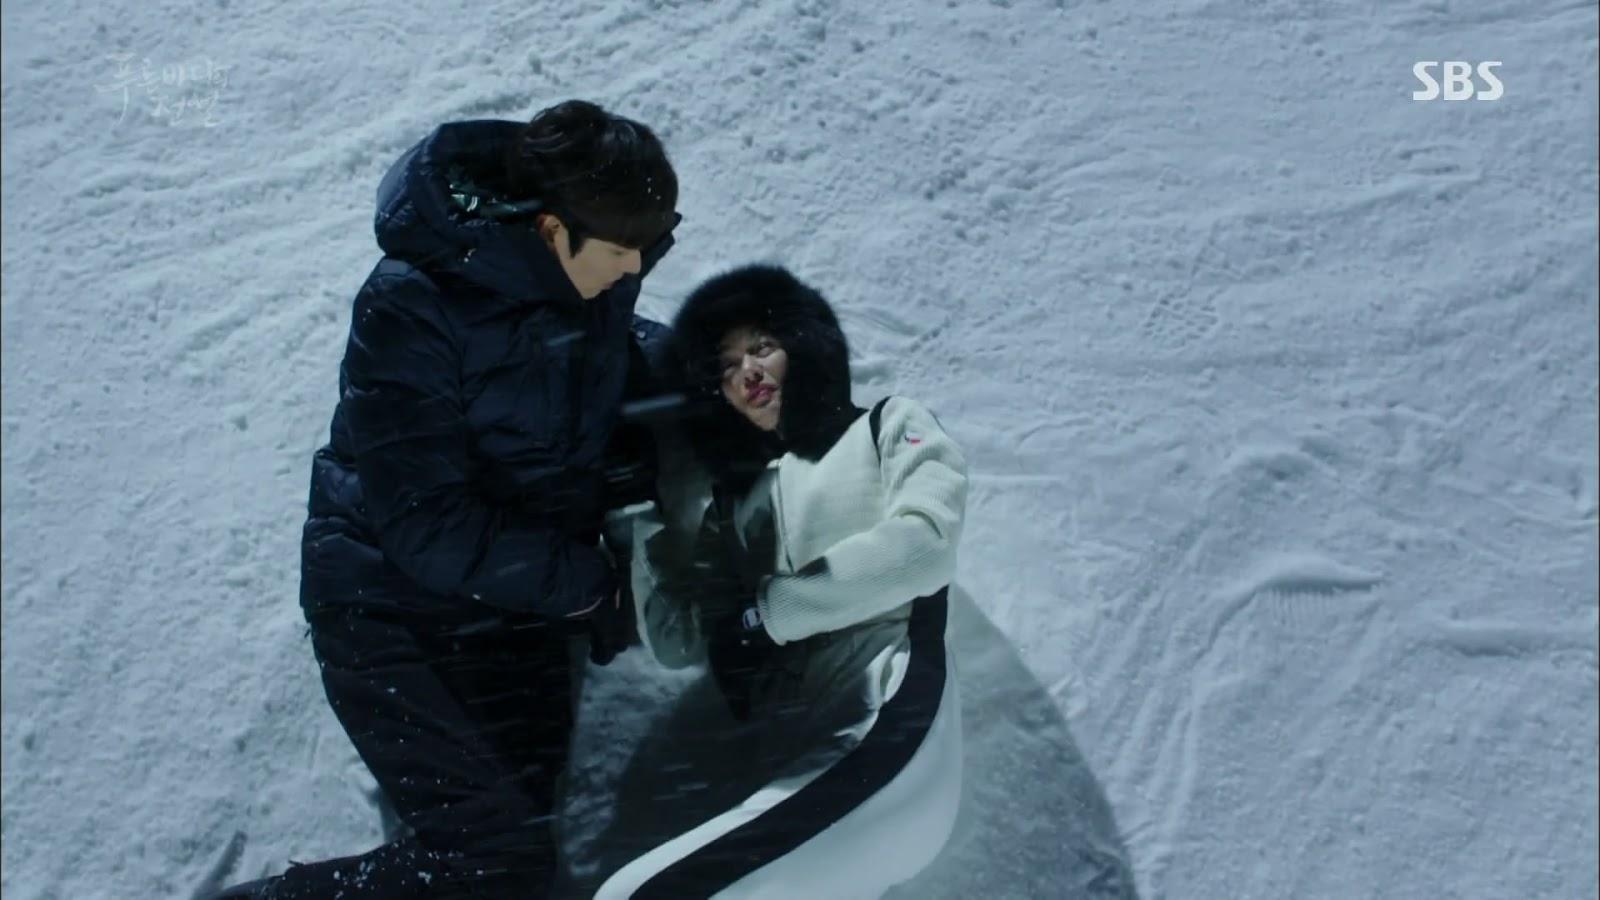 Screenshot Joon Jea And Cheong Yi Very Sweet Moment Scene The Legend Of The Blu Sea (2016)  1080p Episode 07 - www.uchiha-uzuma.com